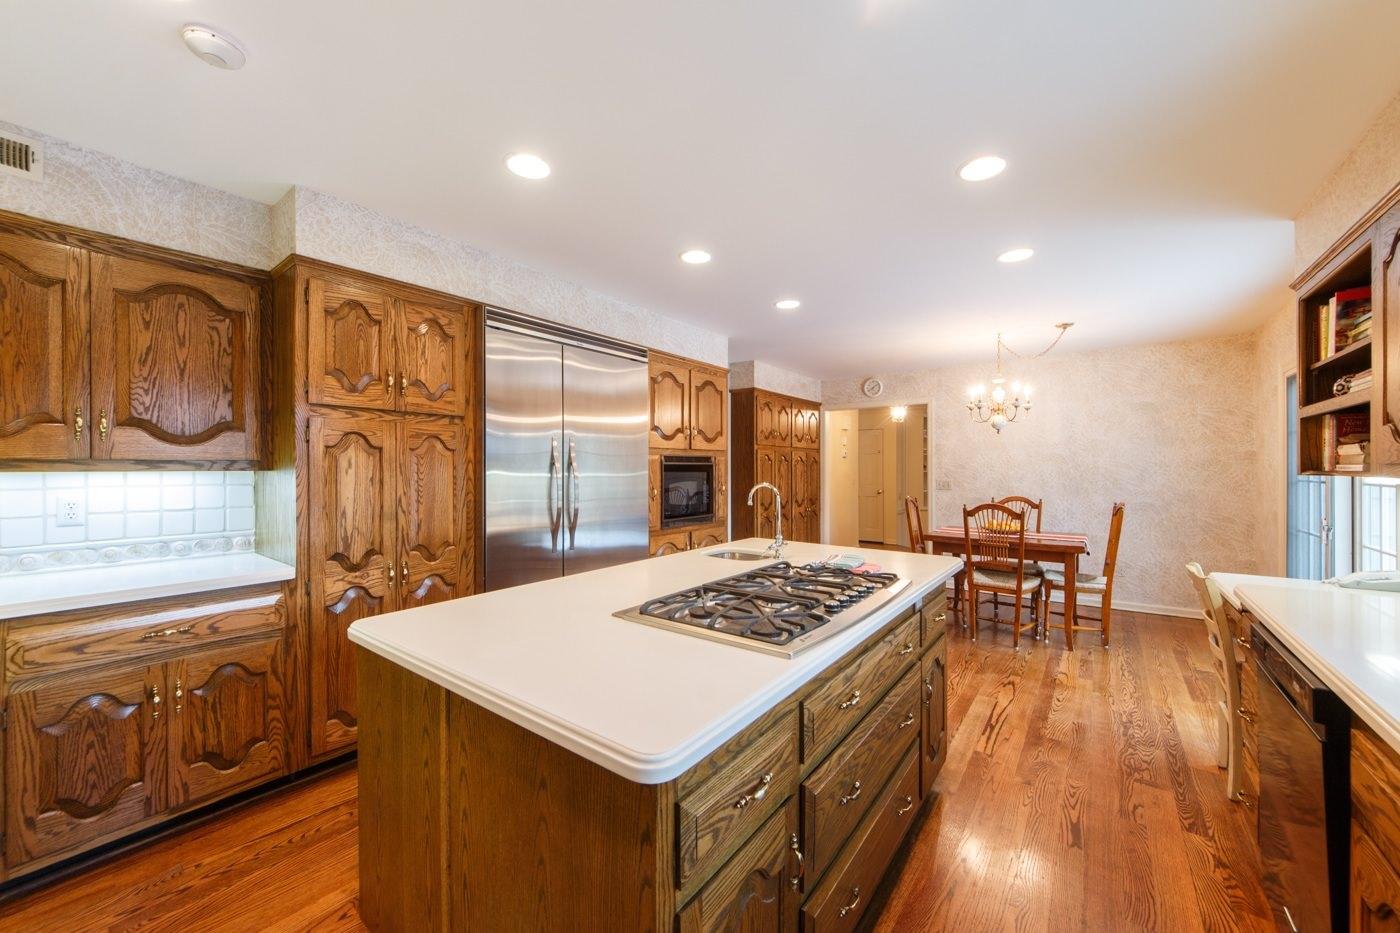 Kitchen cabinets summit nj - 115 Woodland Ave Summit Nj 07901